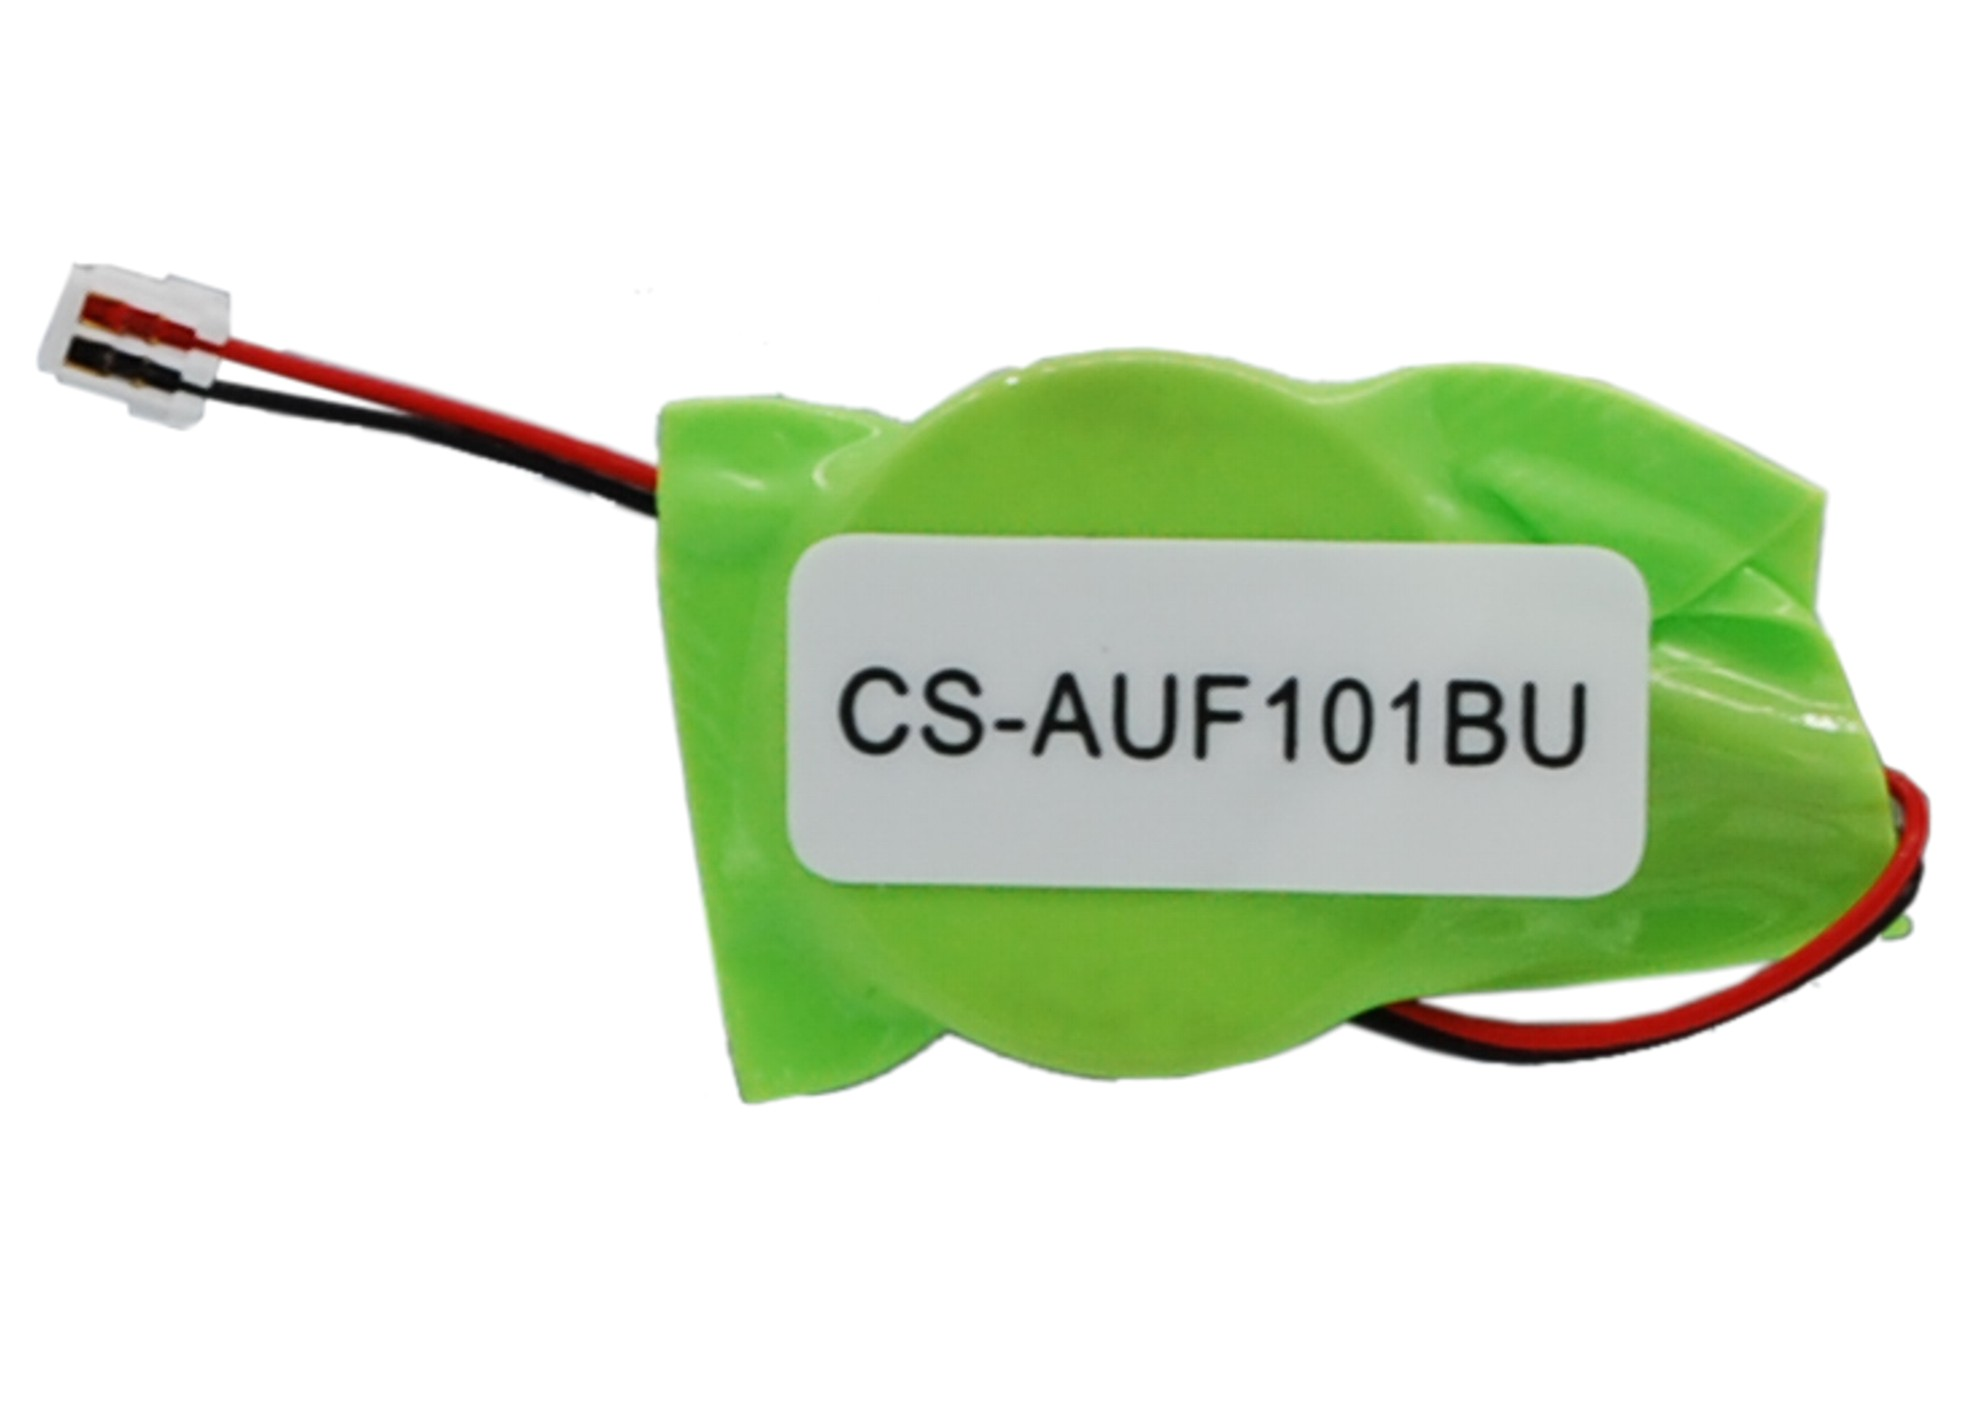 Cameron Sino baterie cmos pro ASUS Eee Pad Transformer TF101 prefix Mobile Docking 3V Li-ion 40mAh zelená - neoriginální